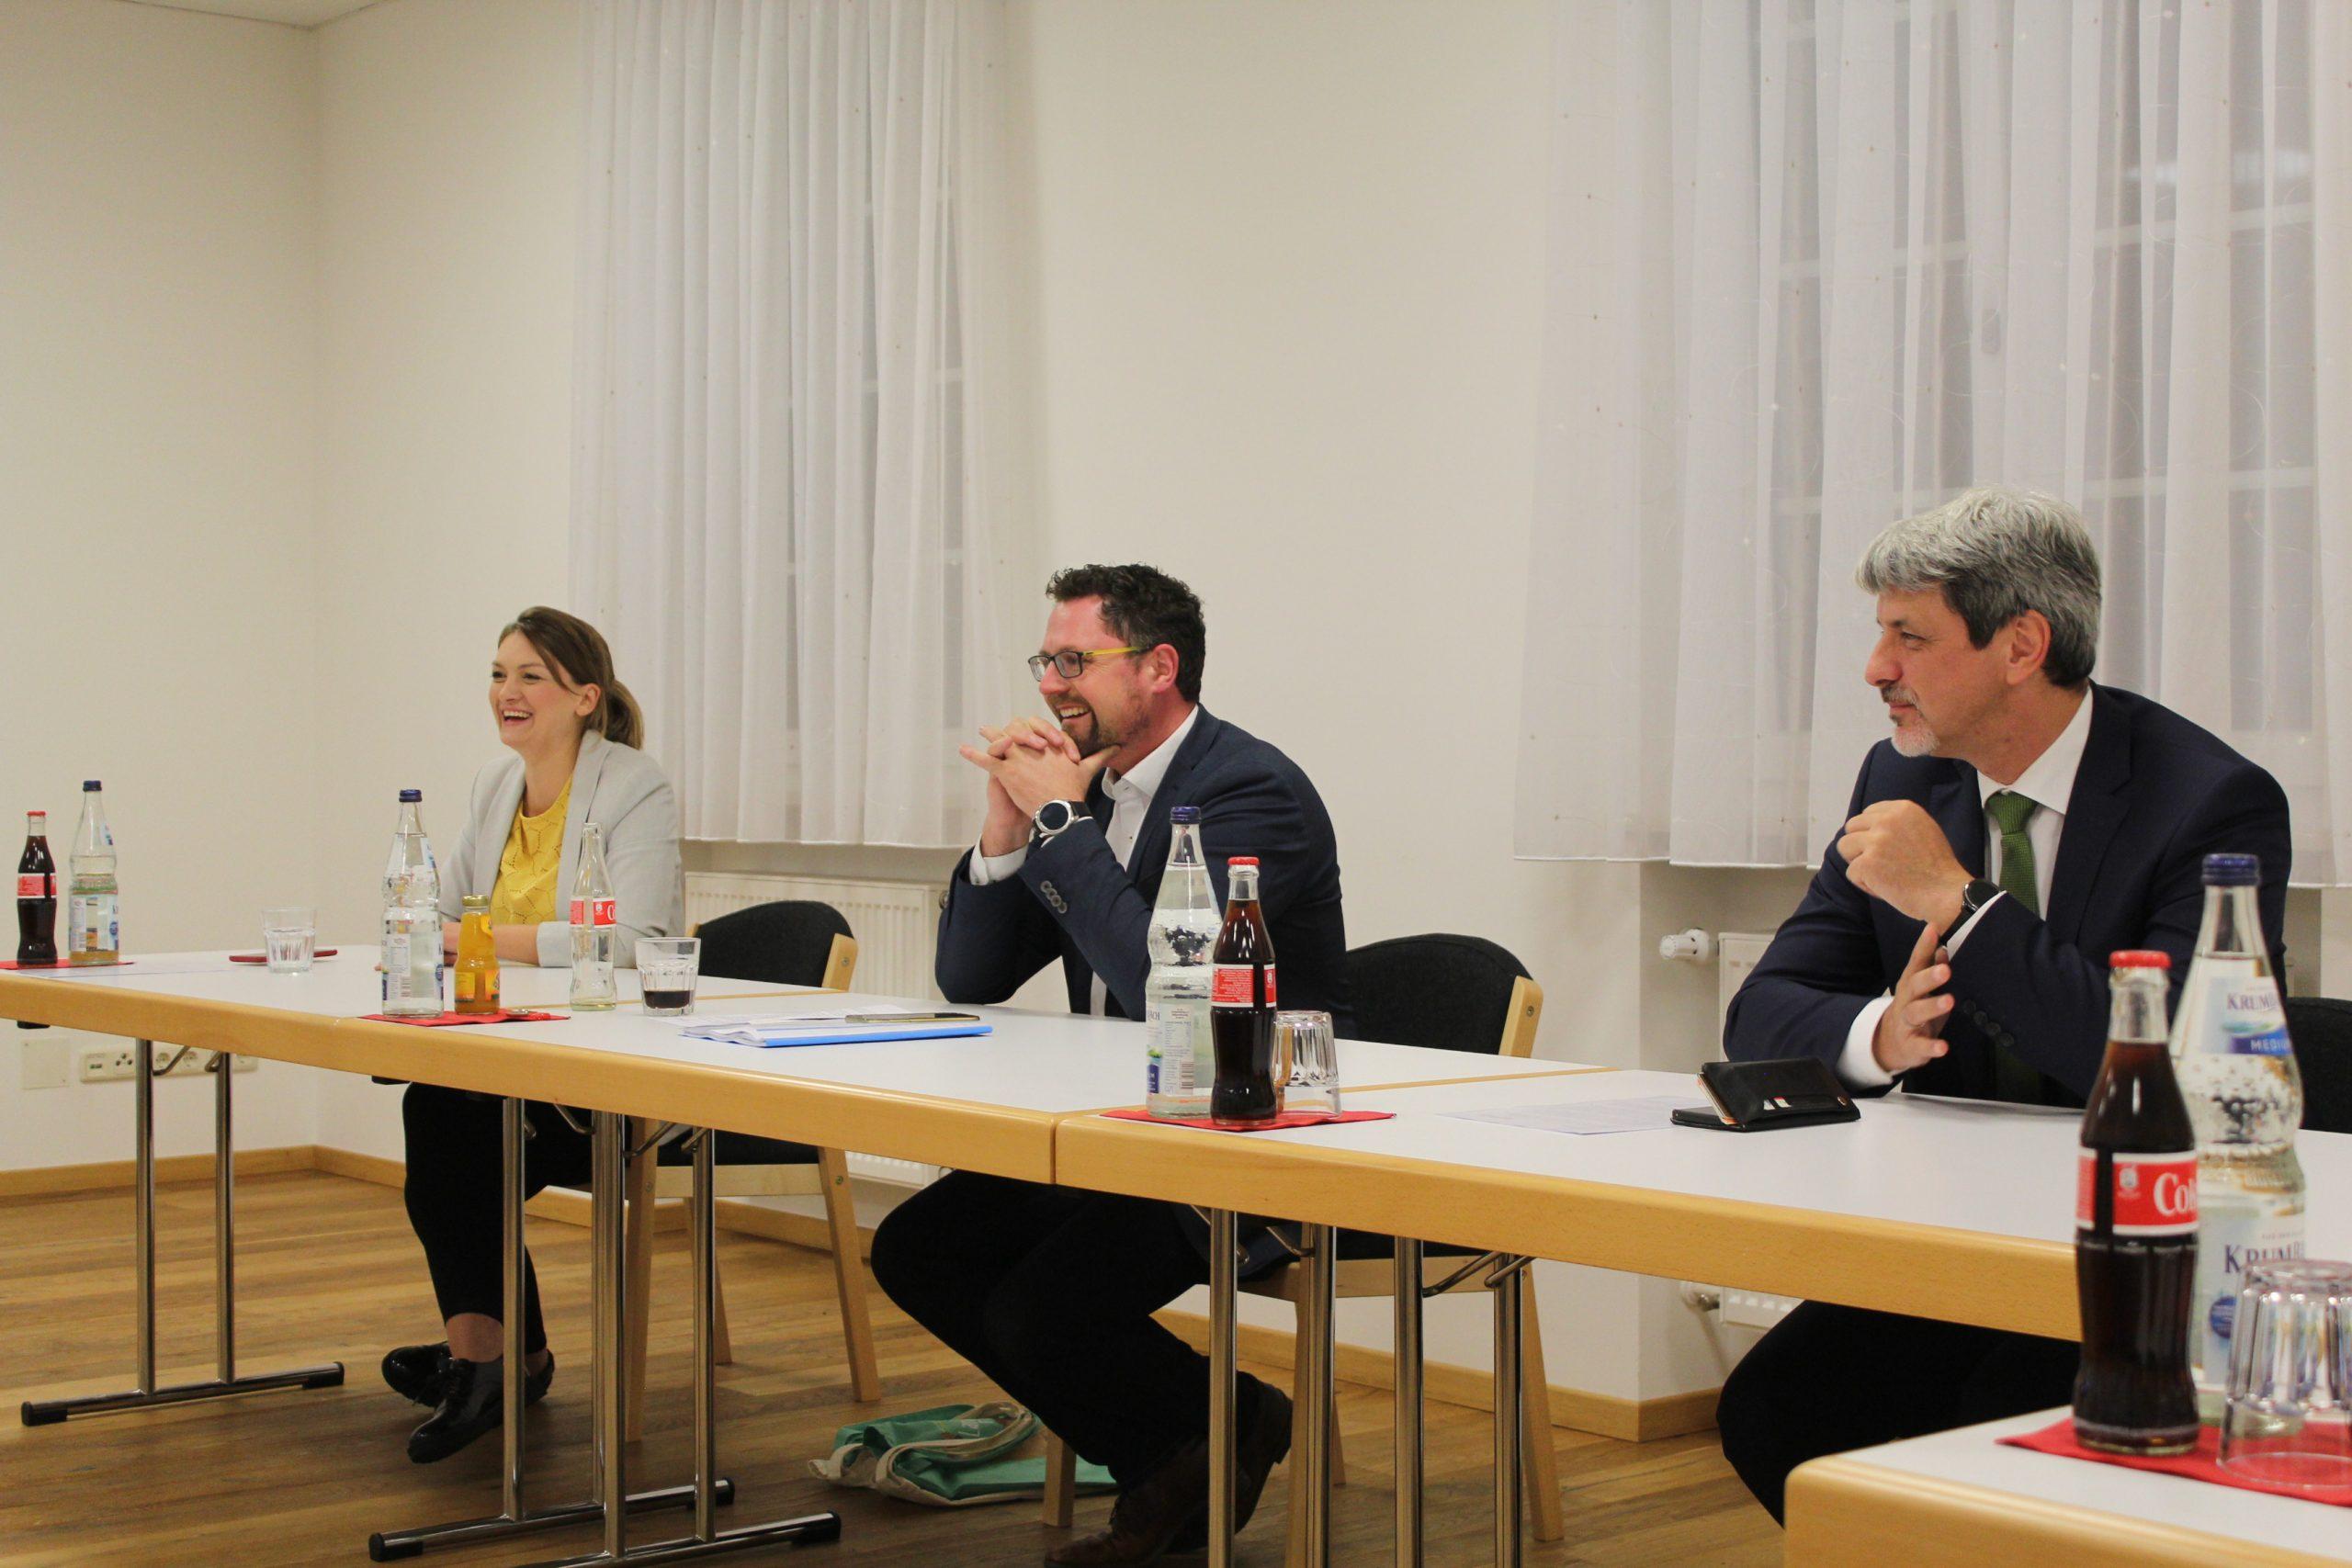 Staatsministerin_Judith_Gerlach zu_Besuch_MEKmedia_2